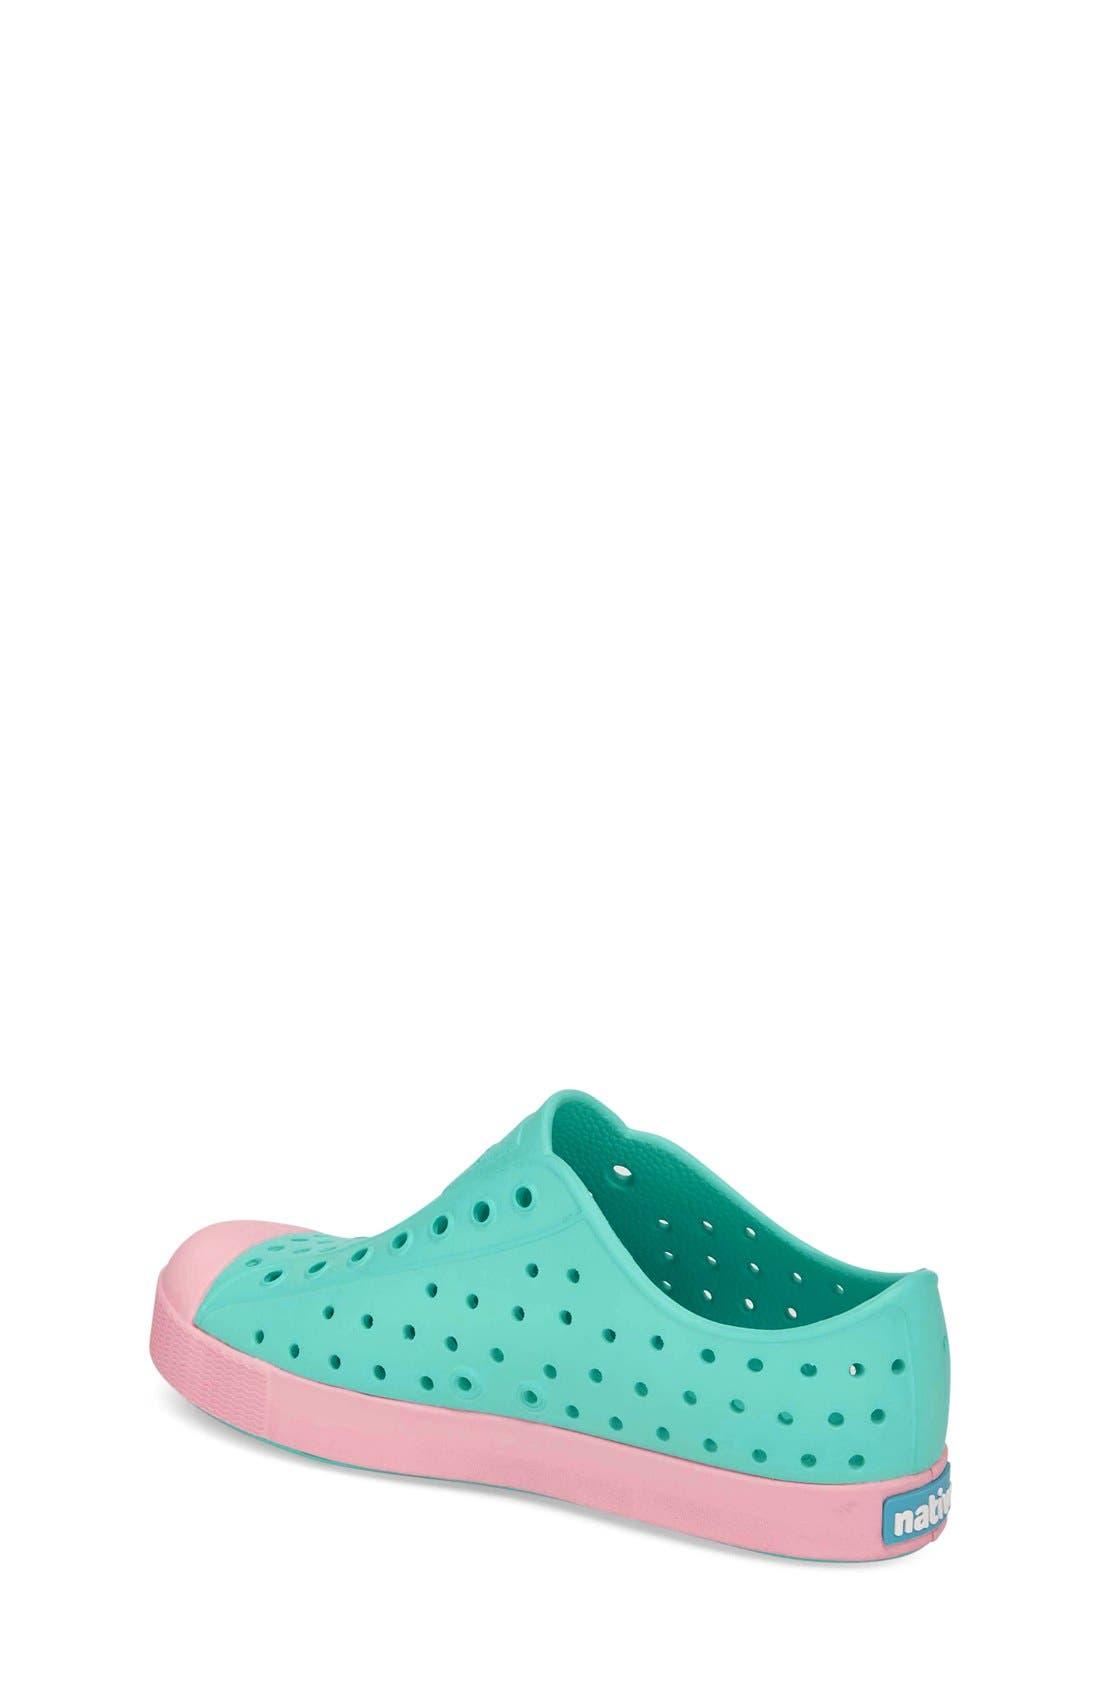 'Jefferson' Water Friendly Slip-On Sneaker,                             Alternate thumbnail 104, color,